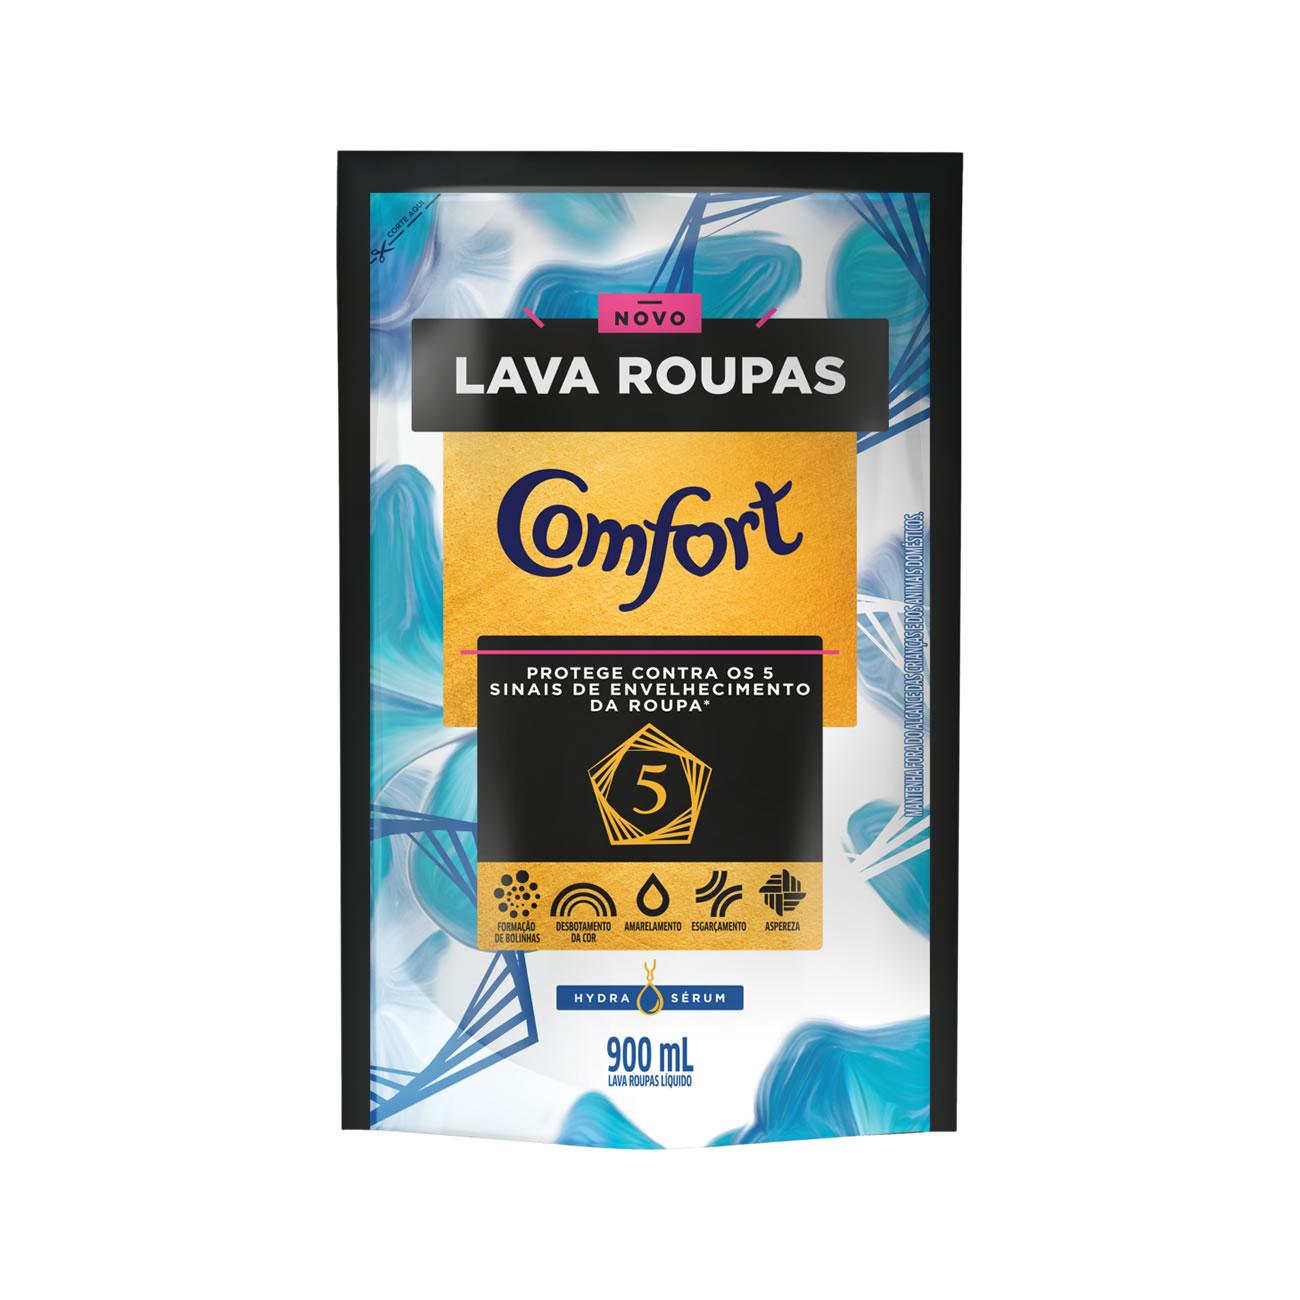 Lava Roupas Liquido Comfort Hydra Serum Refil 900Ml